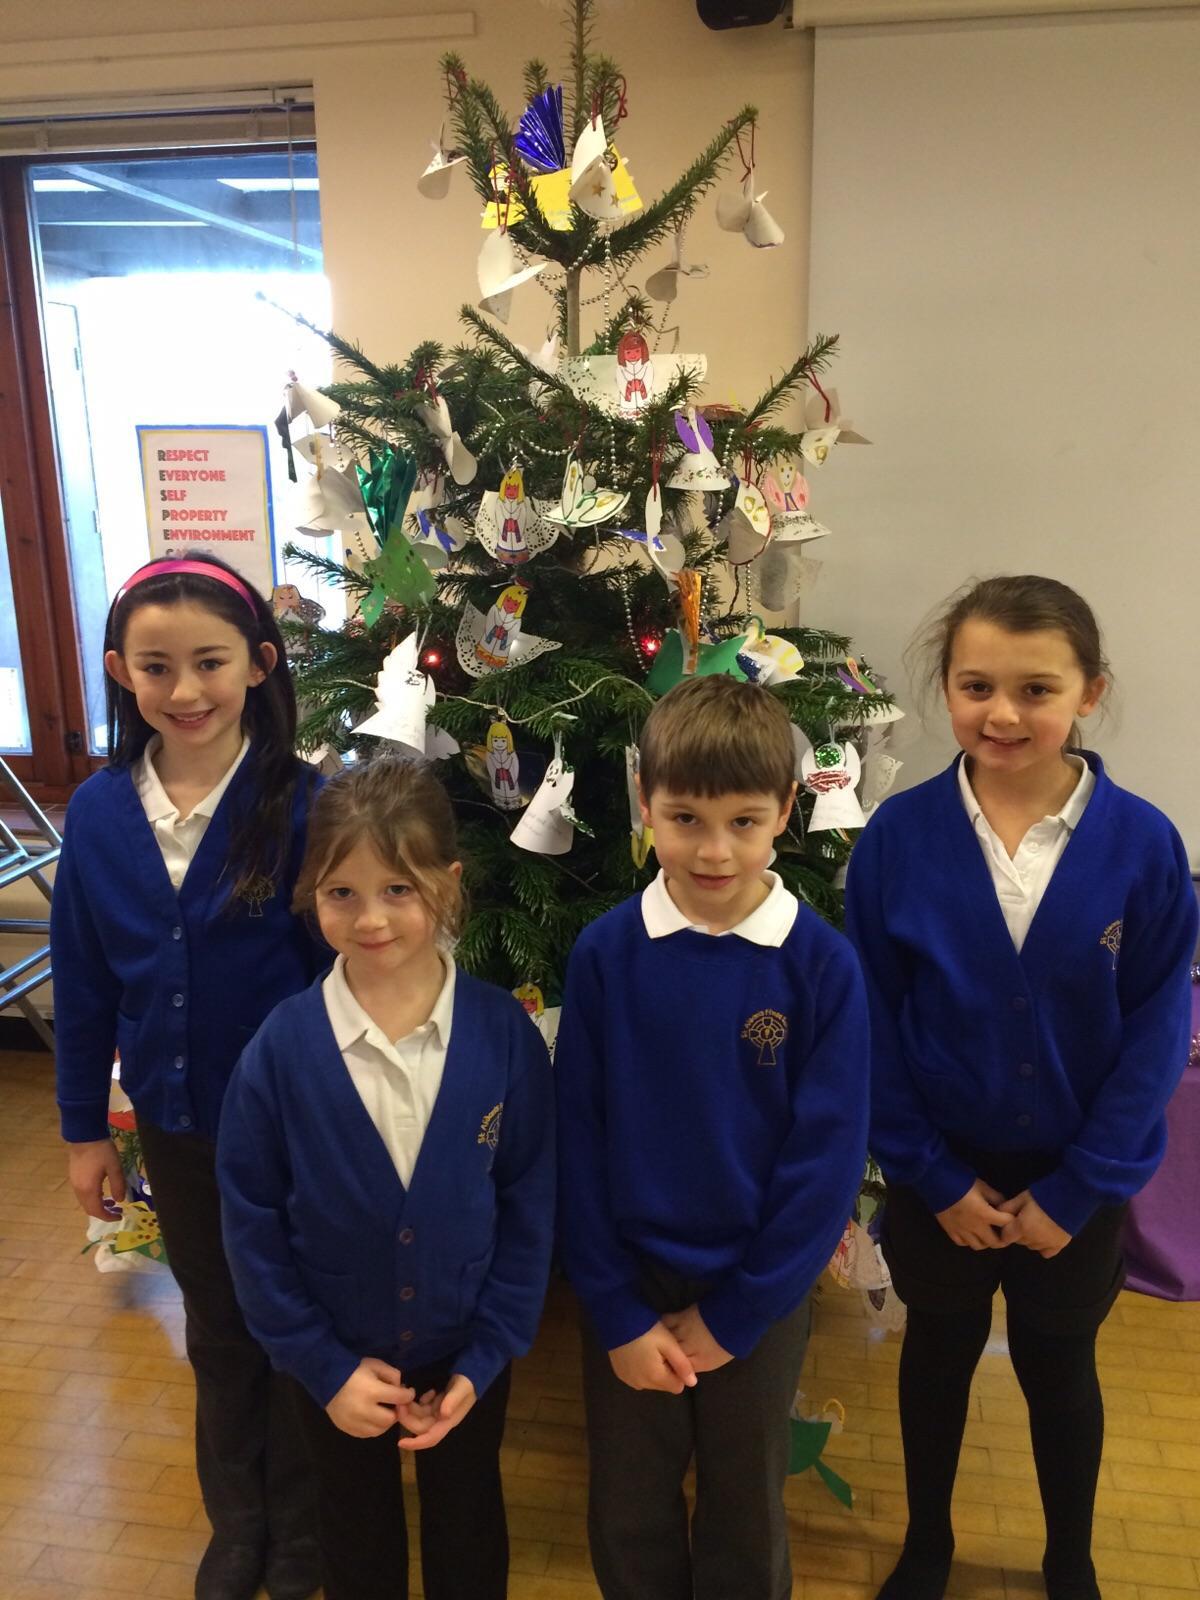 St Aidans School